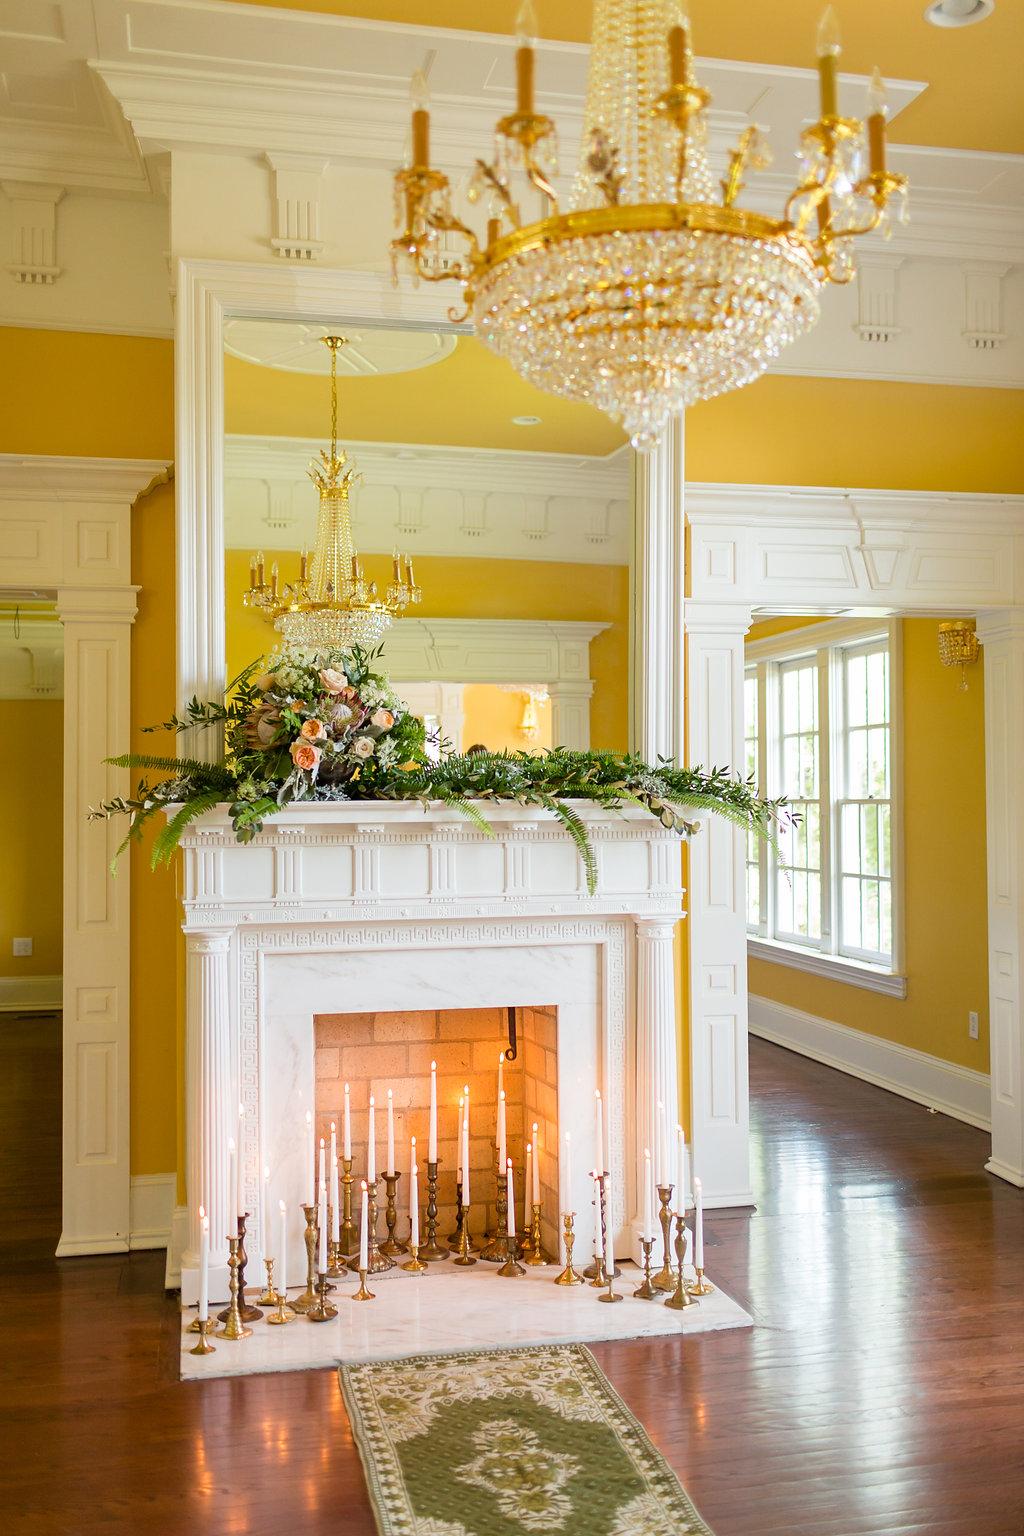 Locklane Weddings & Events +Fireplace + Wedding Inspiration + GranDale Manor + Caley King Newberry